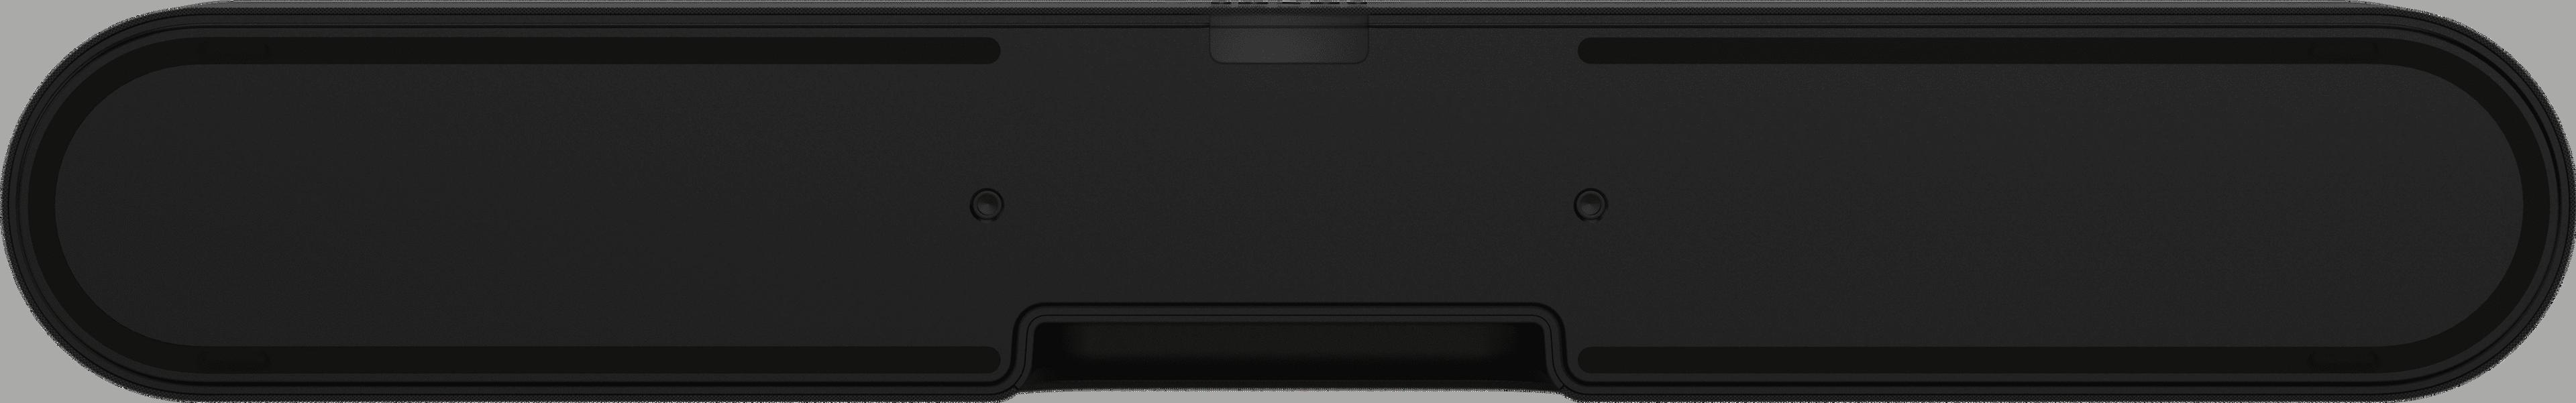 Beam Gen-1 bottom black